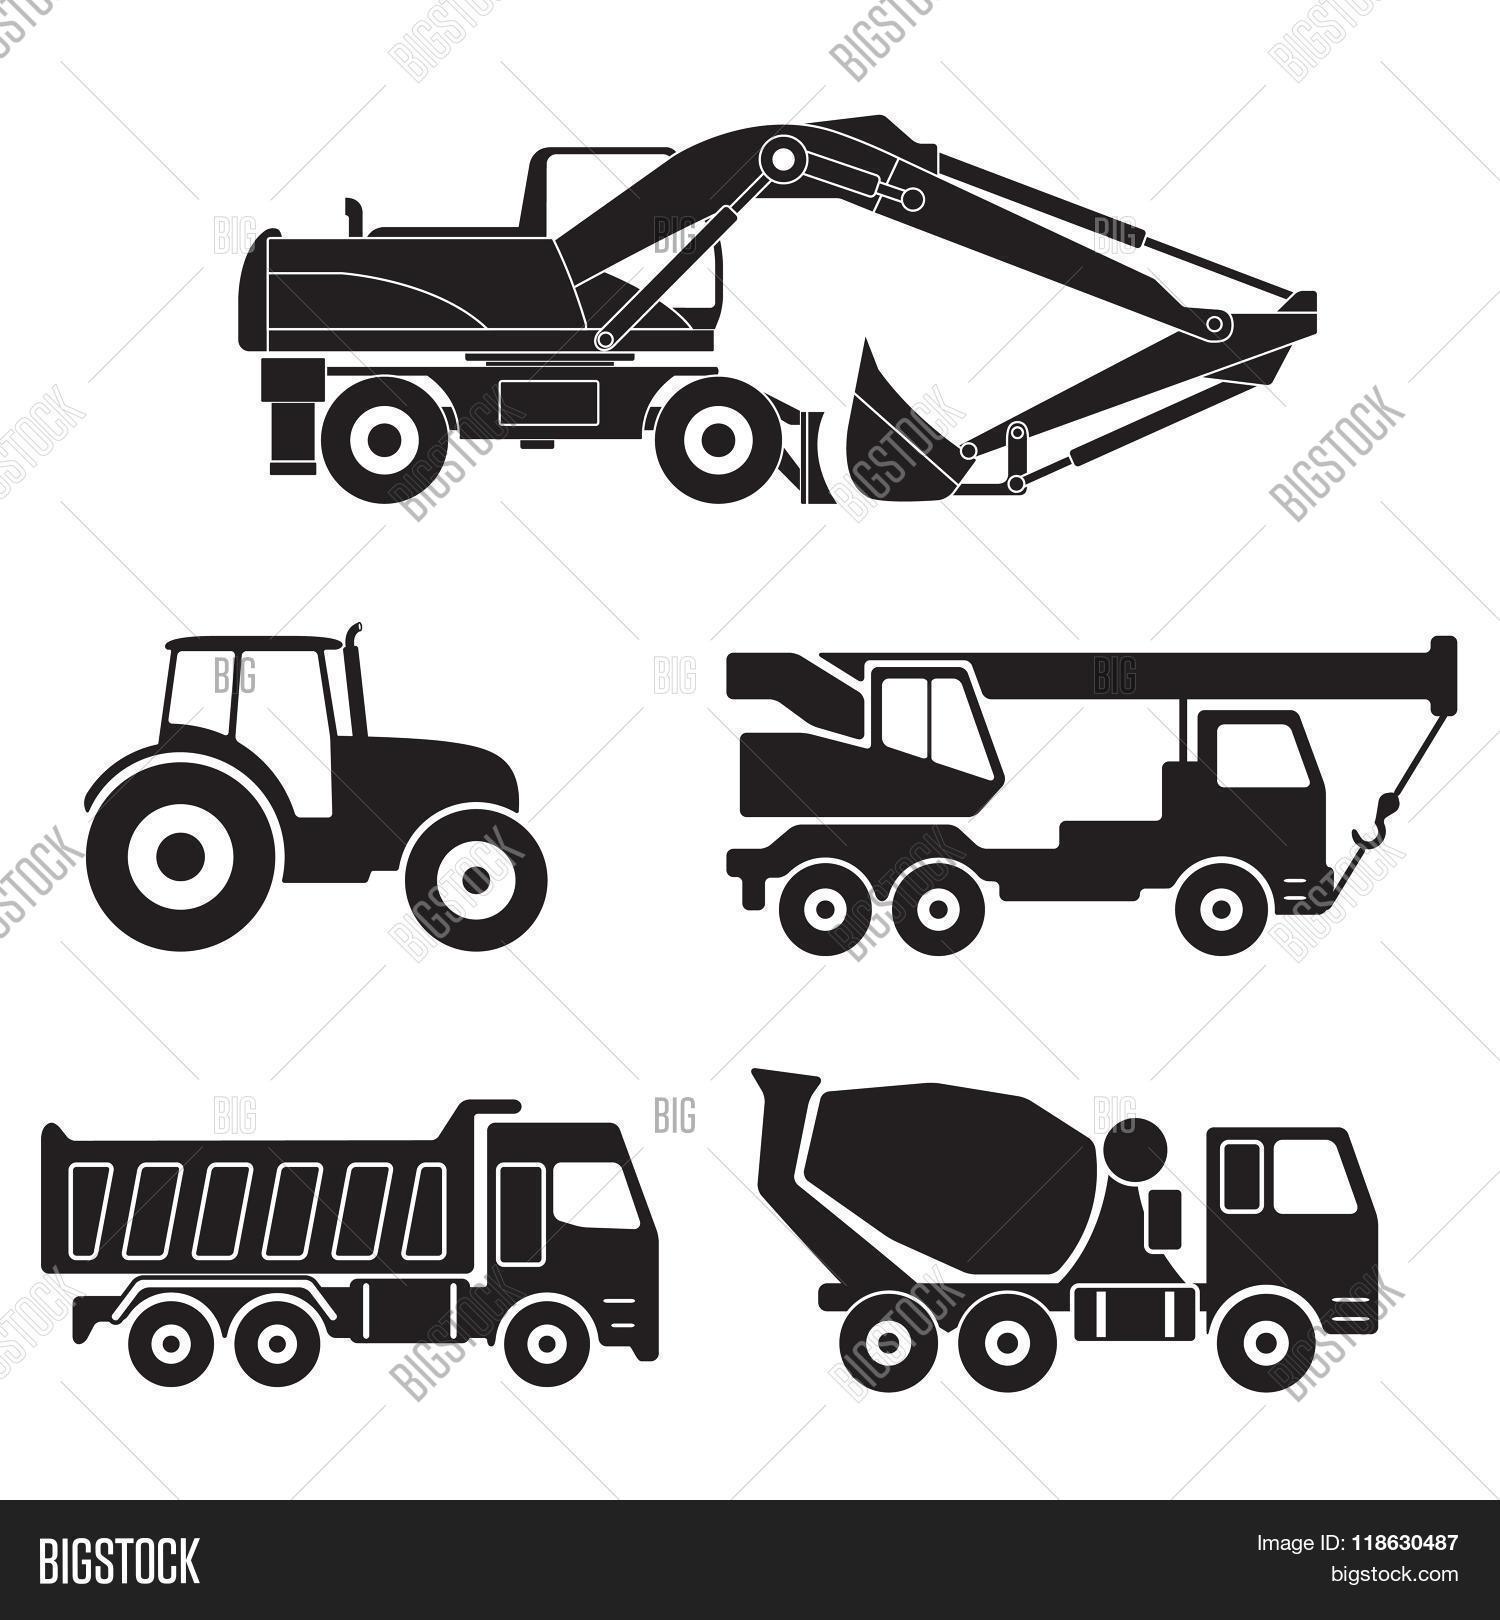 Construction Trucks Vector Amp Photo Free Trial